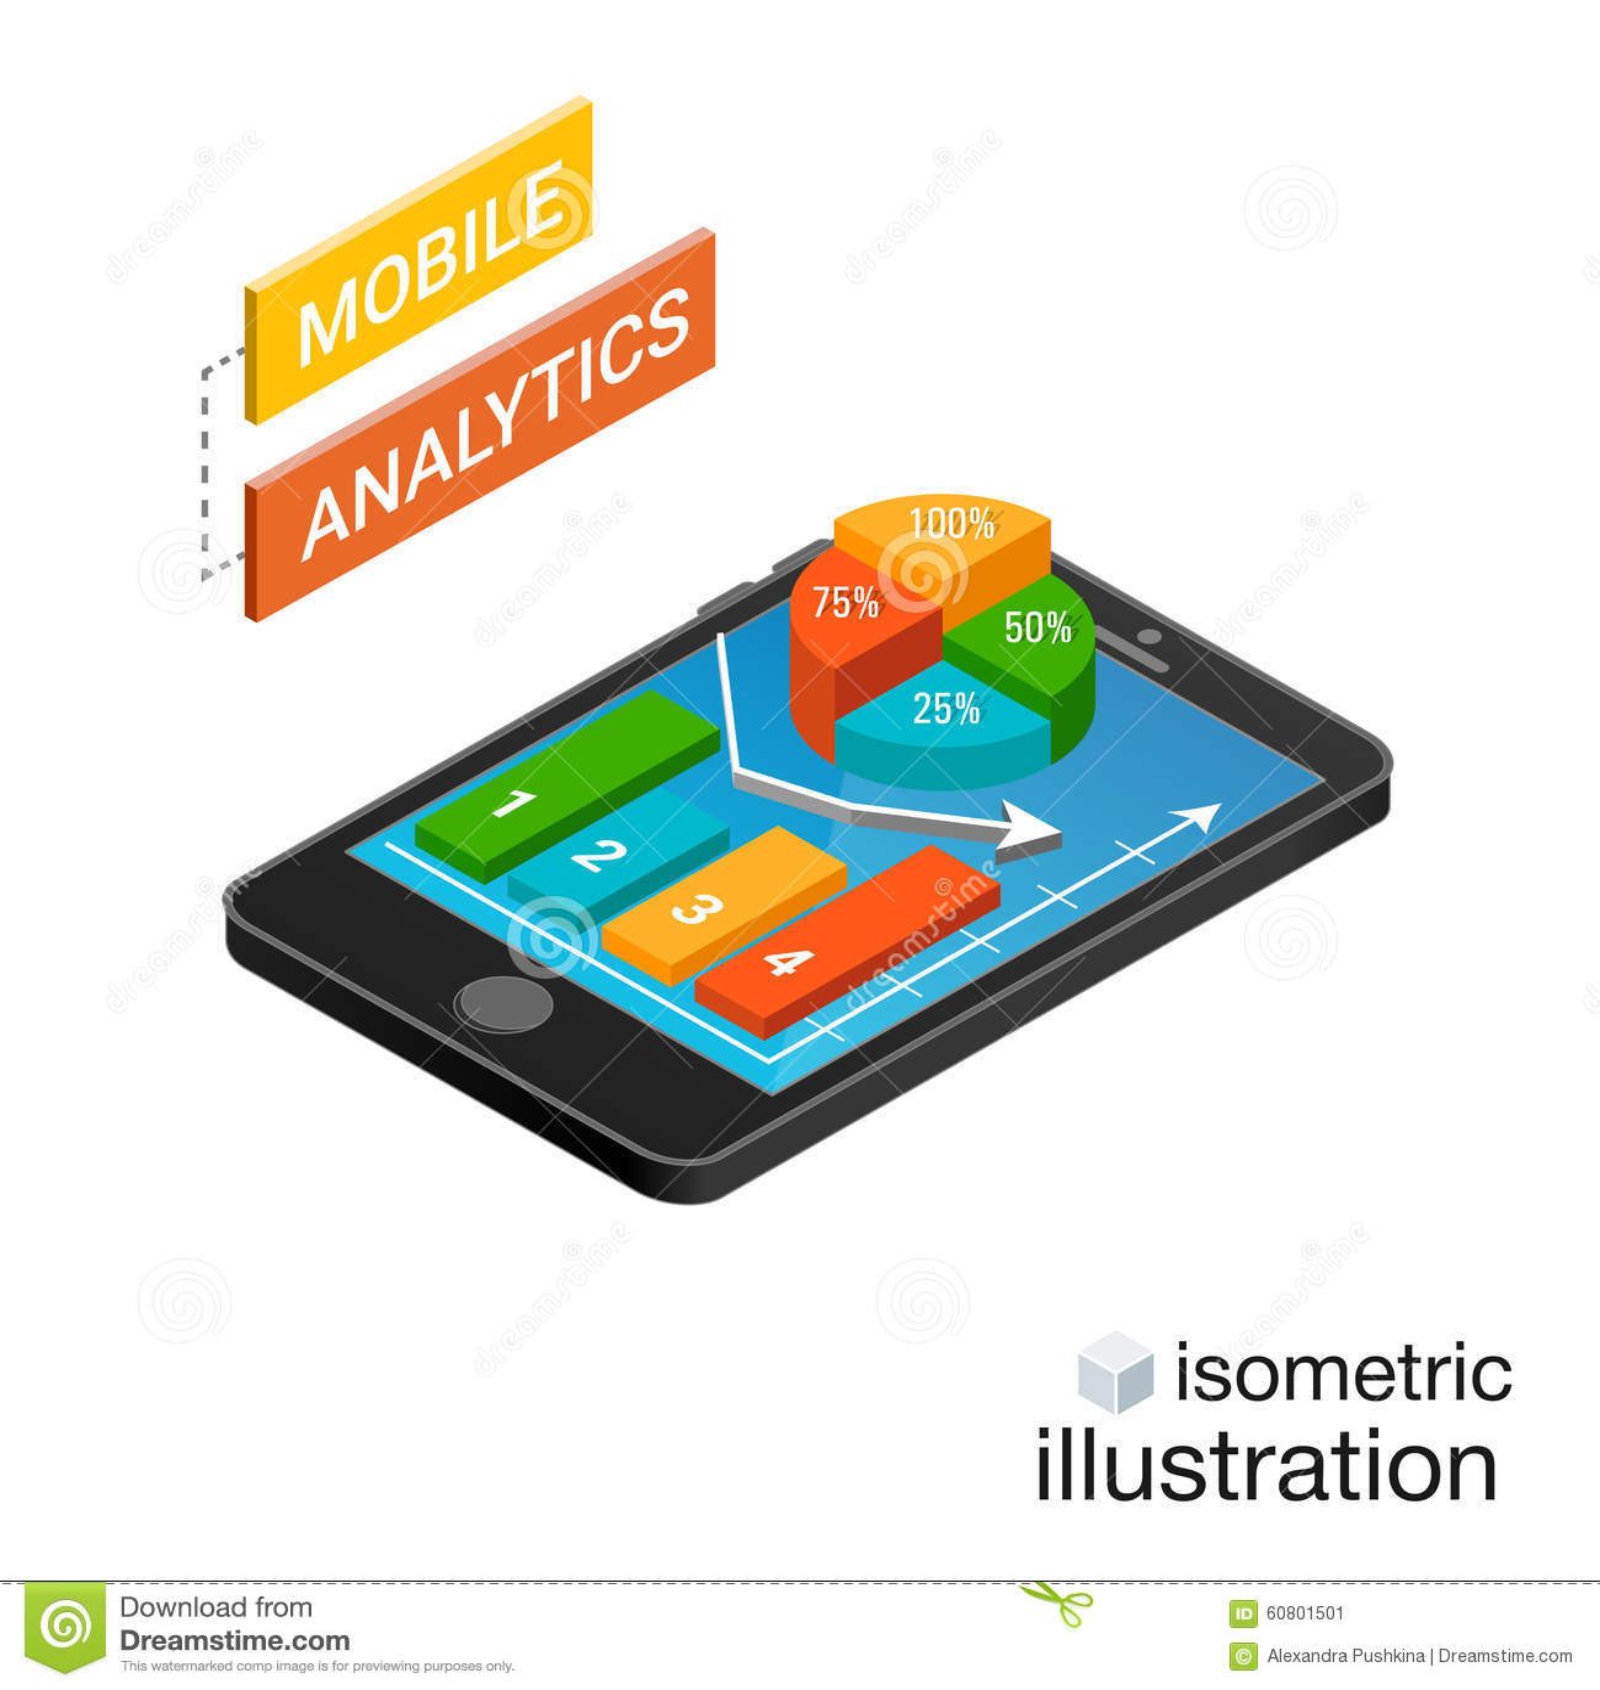 Isometric smartphone με τις γραφικές παραστάσεις σε ένα άσπρο υπόβαθρο Κινητή έννοια analytics Isometric διανυσματική απεικόνιση